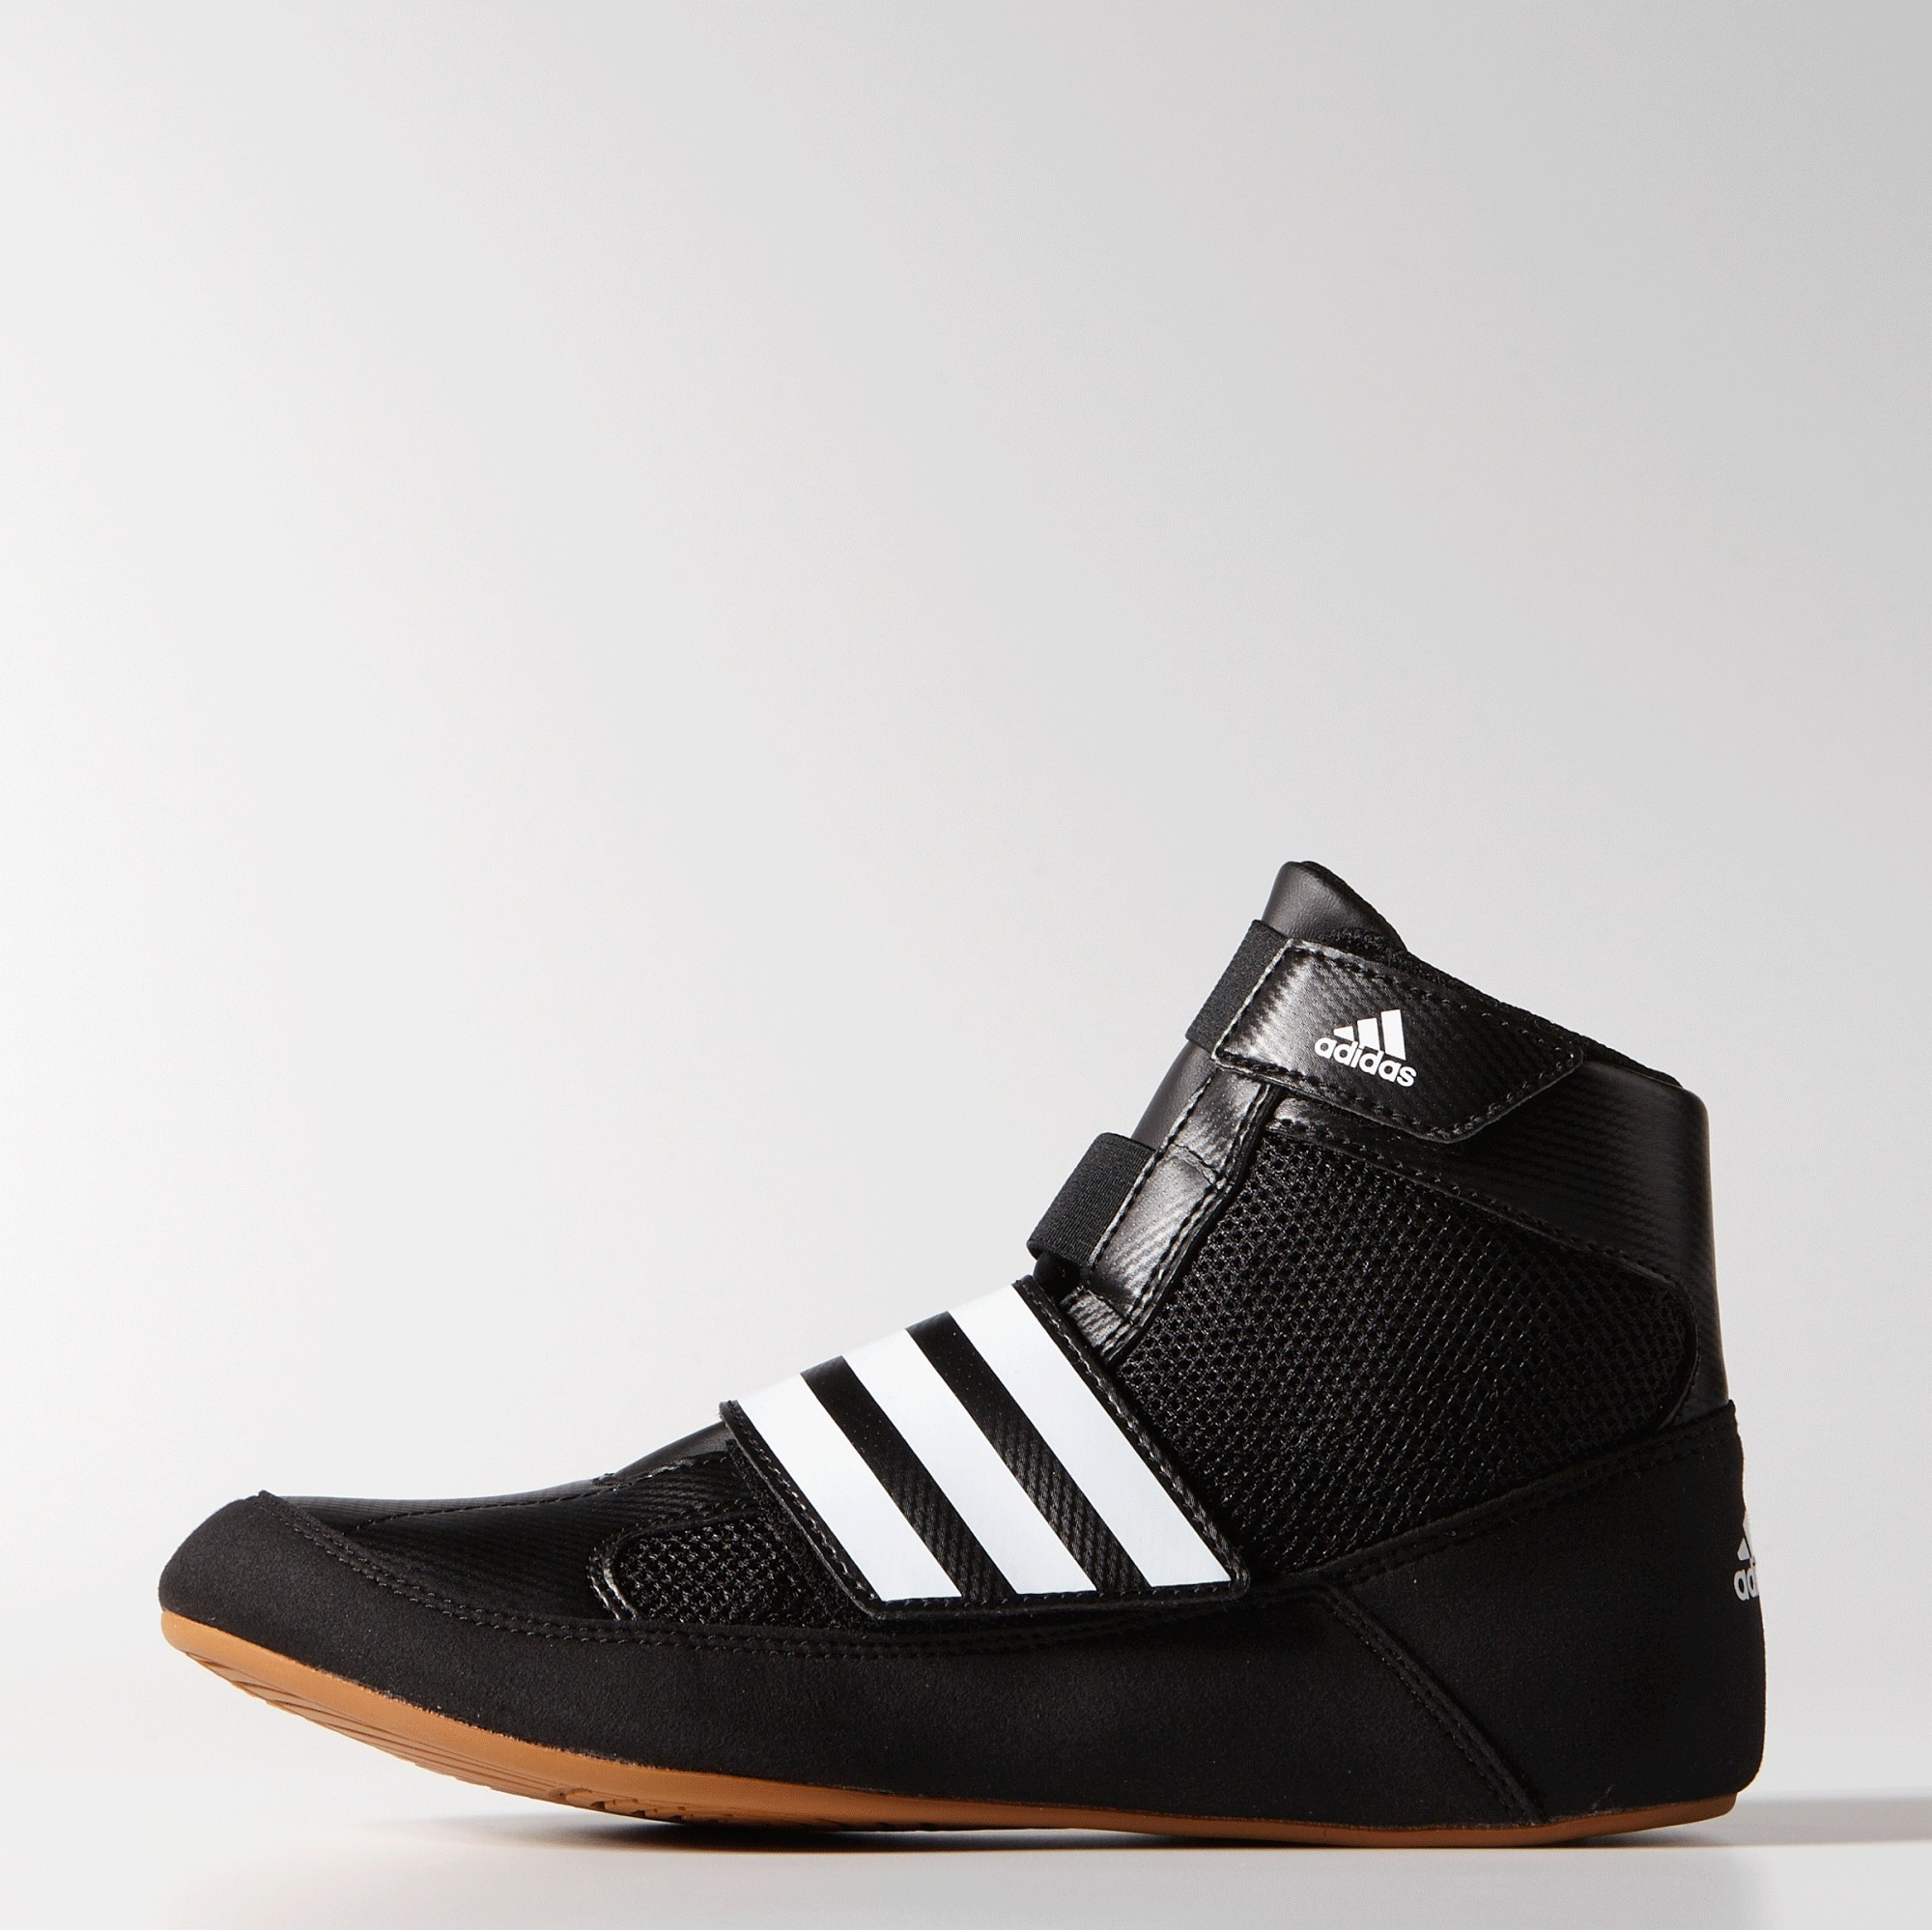 sports shoes 93cbc 5f1b6 Adidas Brottningskor Kids HVC 2